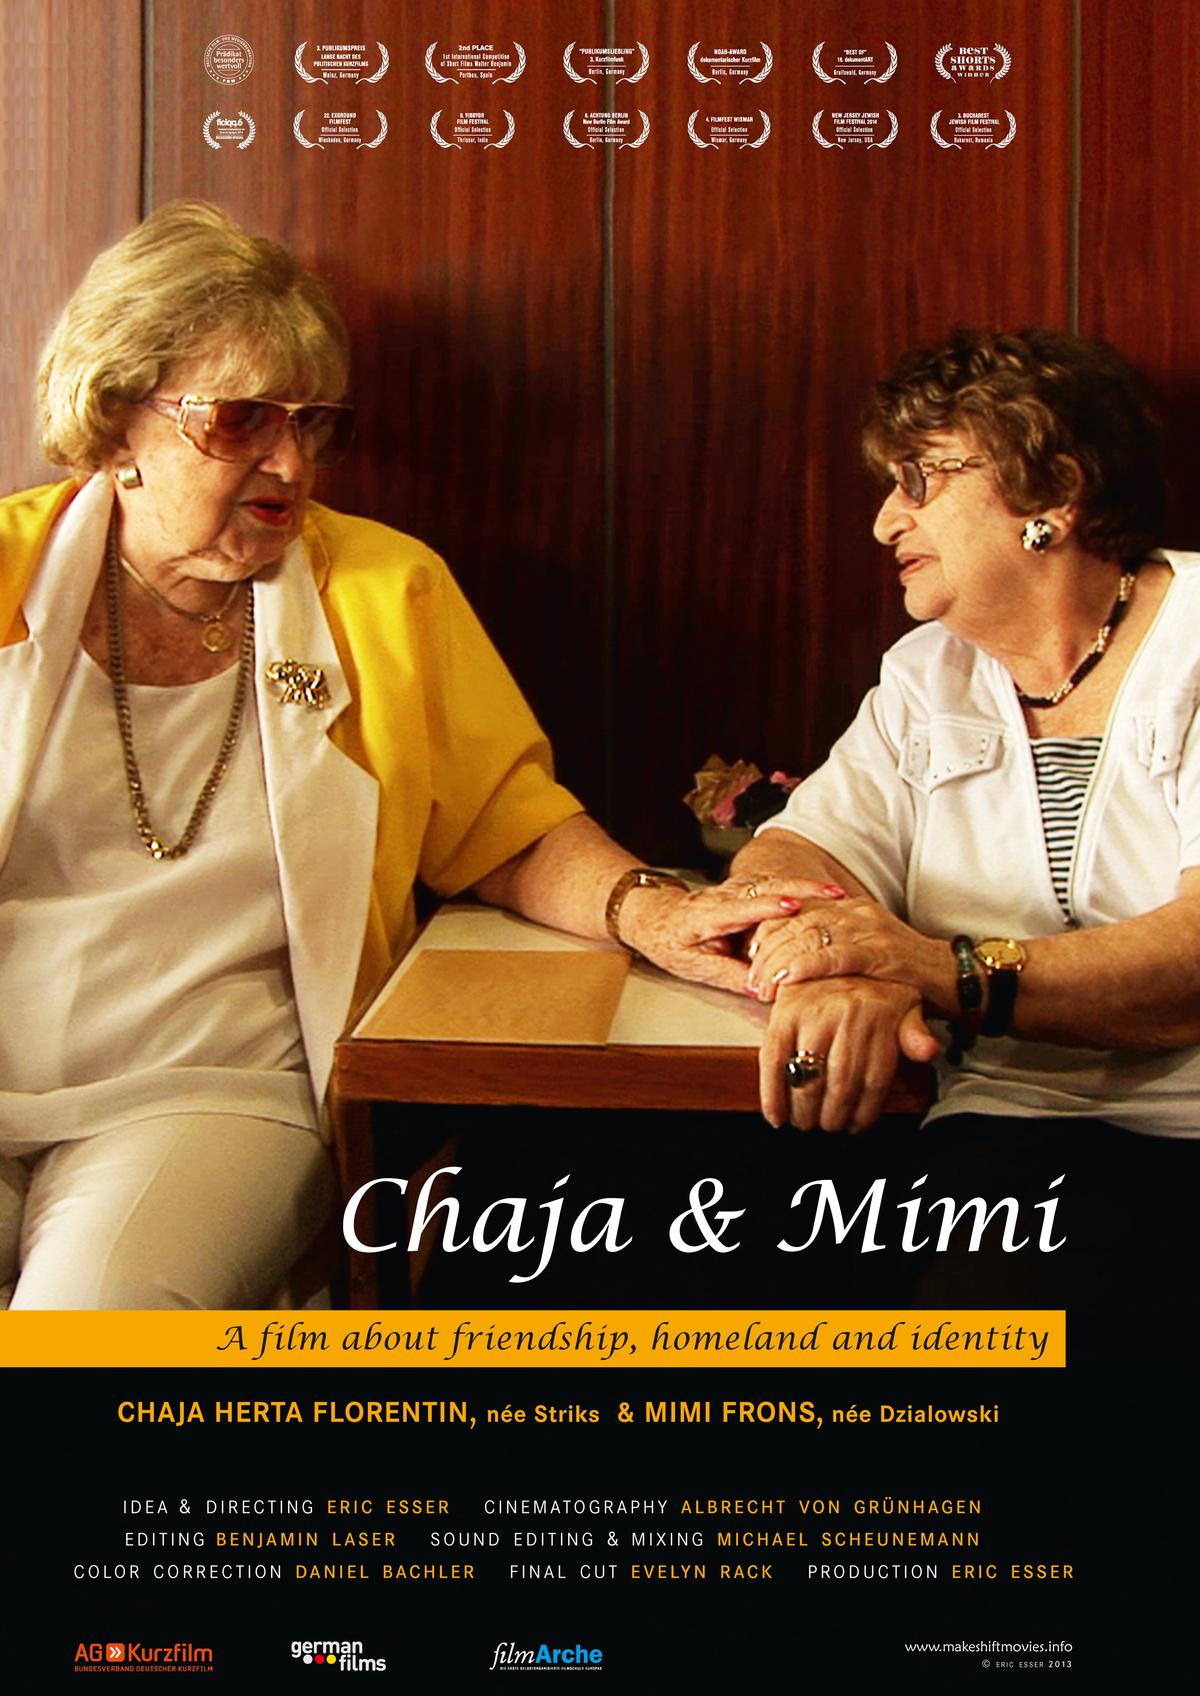 Chaja and mimi